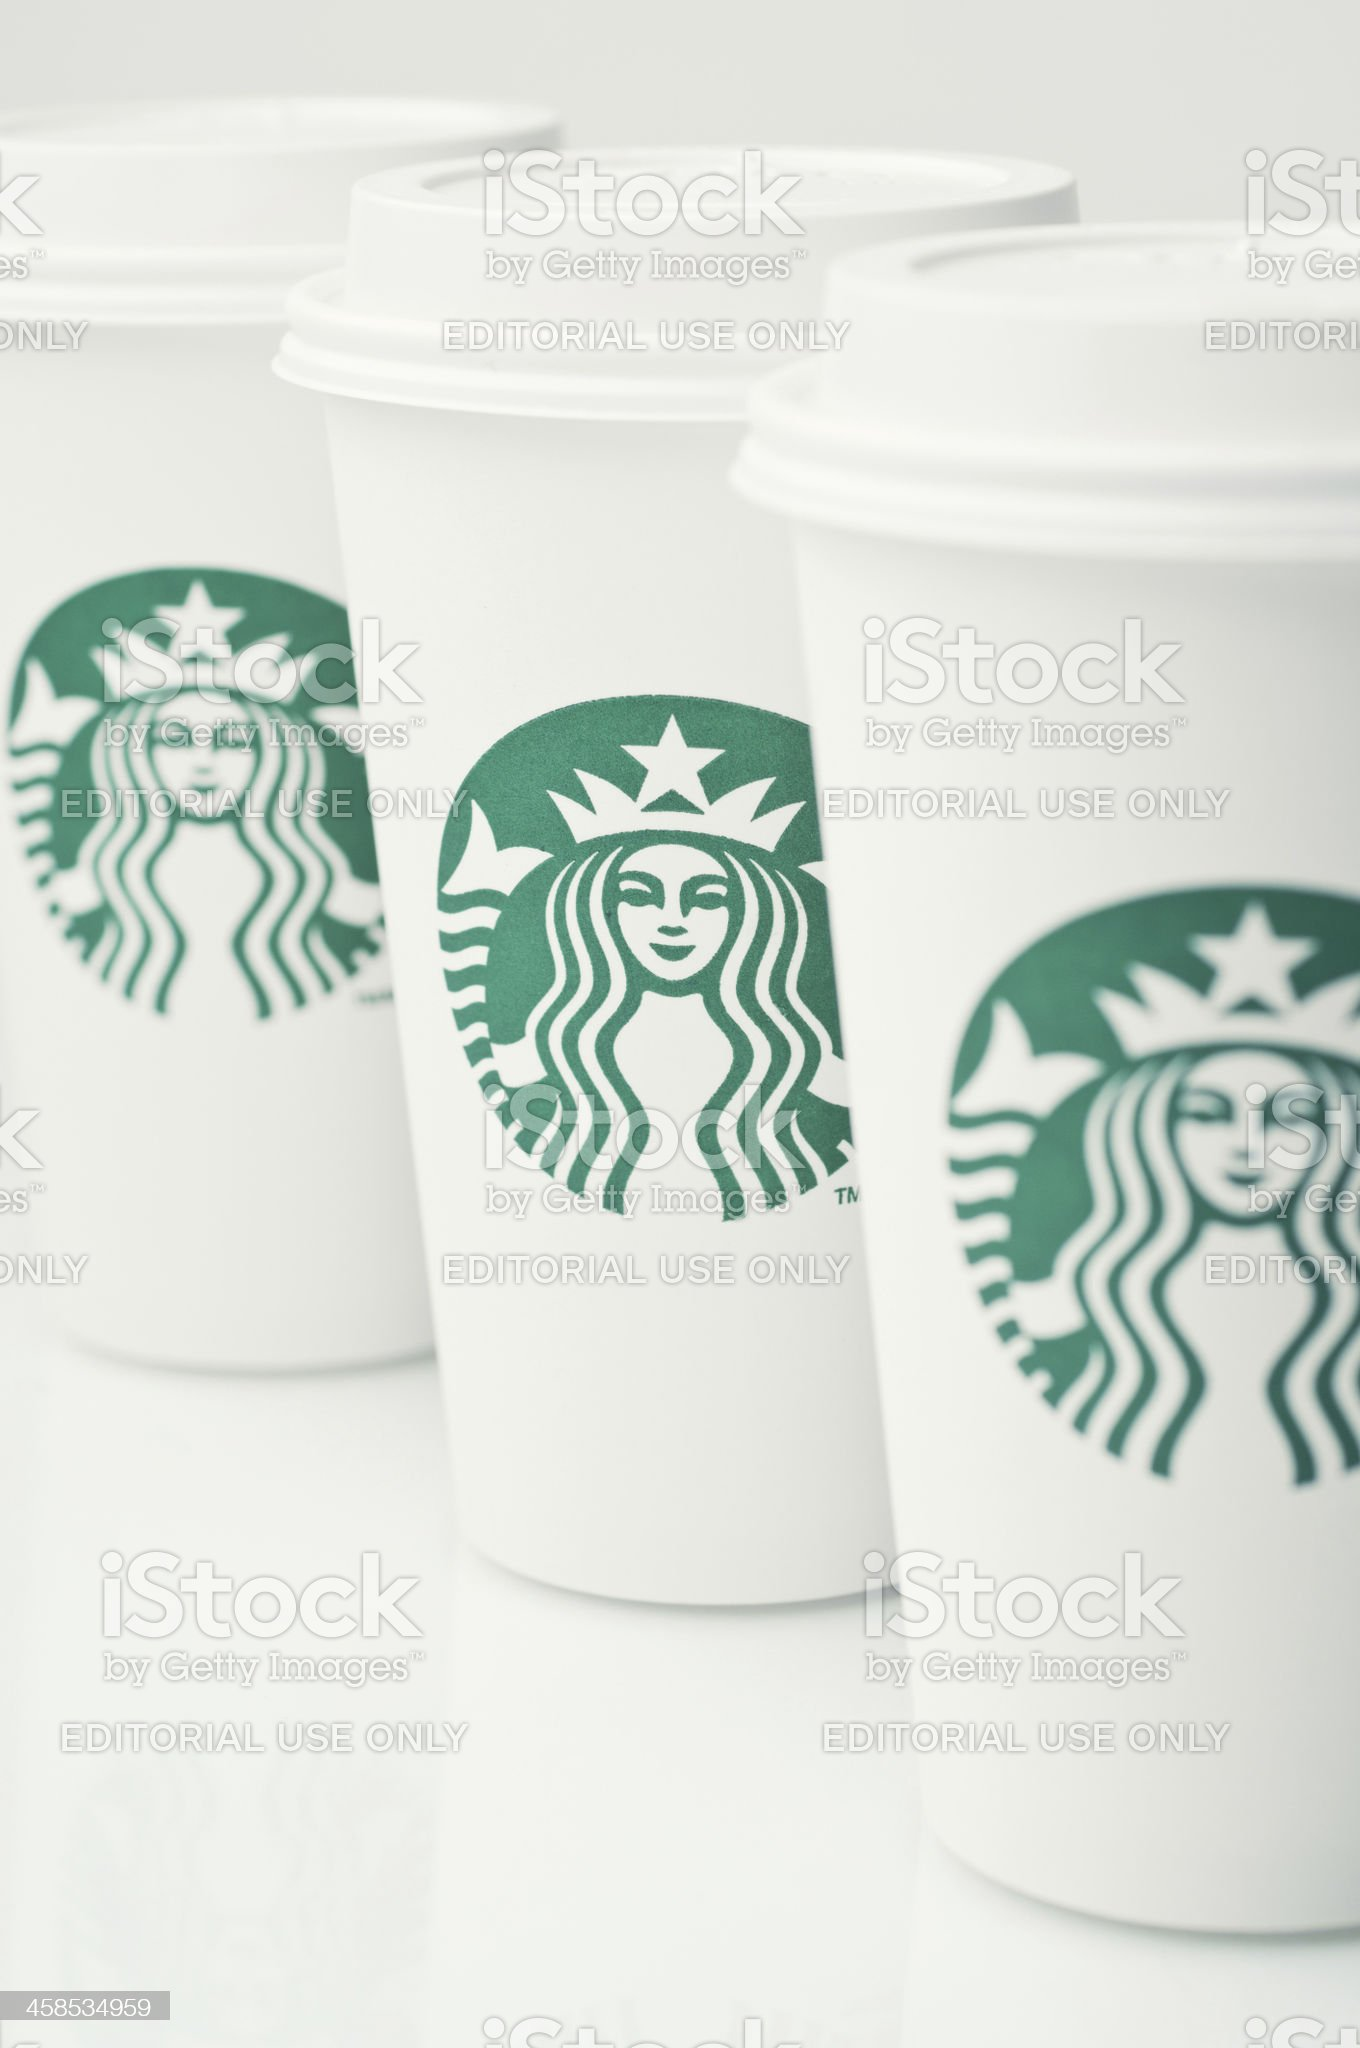 Starbucks Coffee Cups royalty-free stock photo